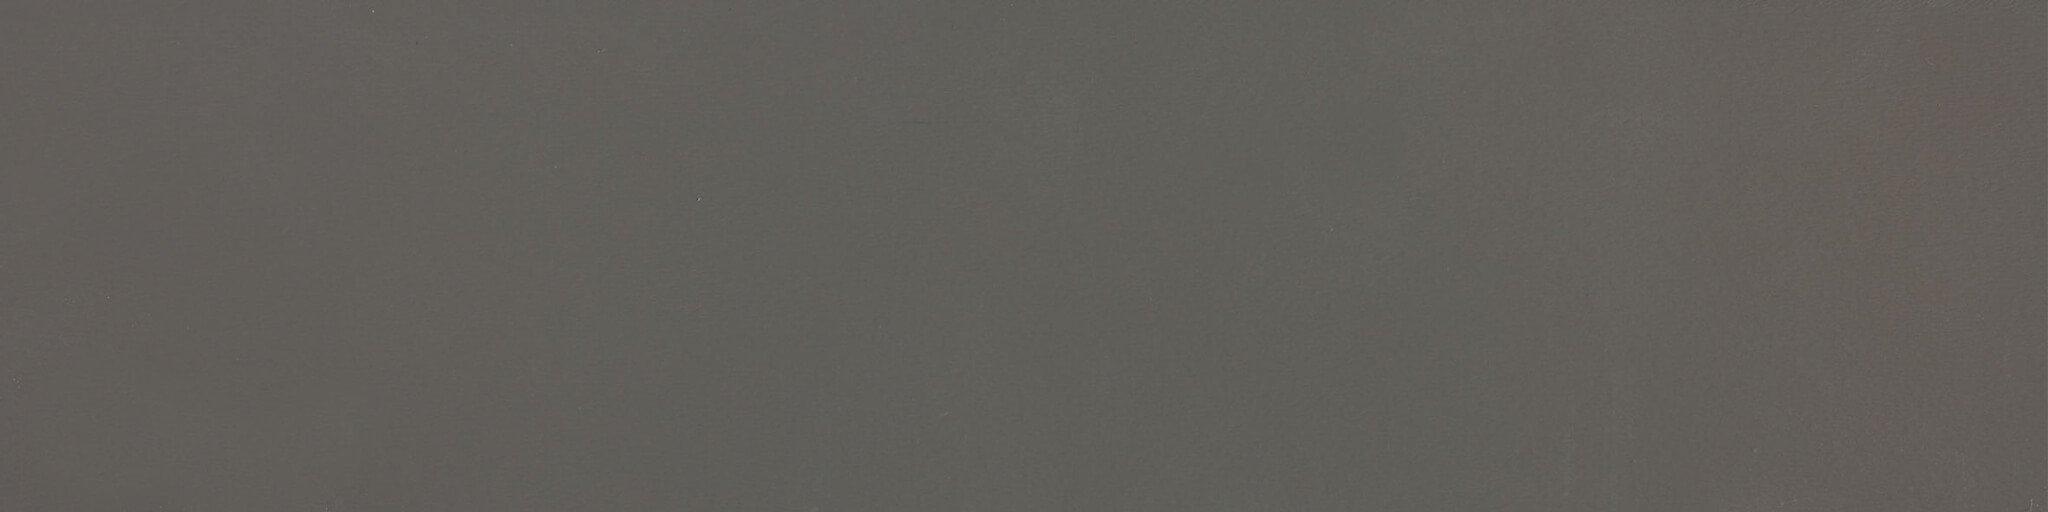 Houten jaloezie 'Basic' 301615 – Pure wood – As – Max 2650 mm breed – alleen beschikbaar in 50 mm